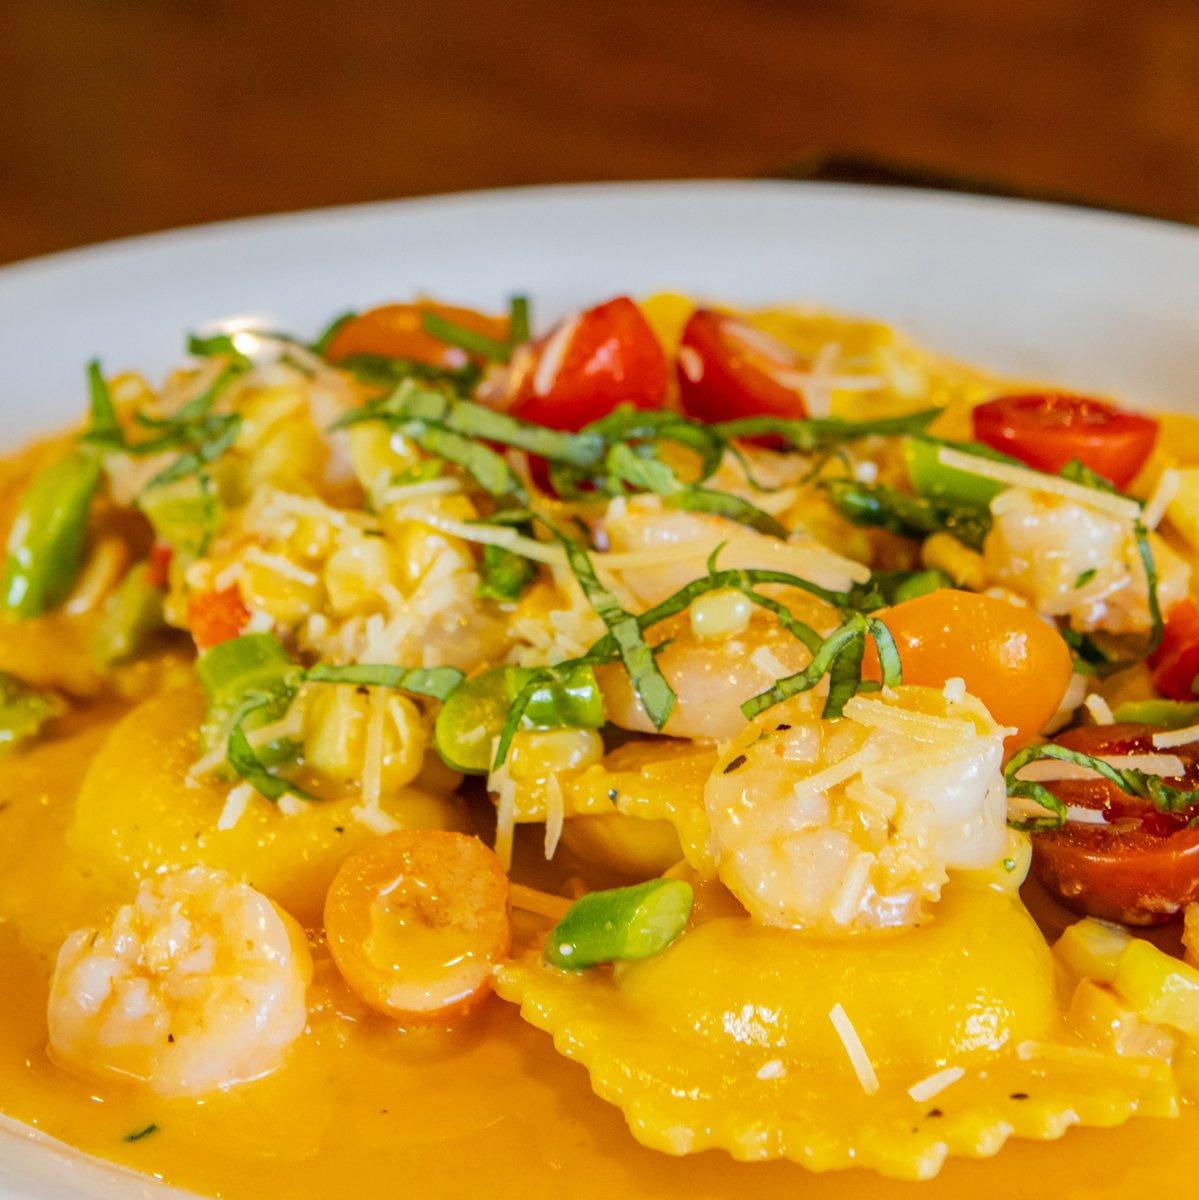 Shrimp and Lobster Ravioli: fresh asparagus, petite tomato, lobster beurre blanc, sweet corn, basil. #LIMITEDtime  #soMUCHyum #alwaysgoodeats #localFAVORITE